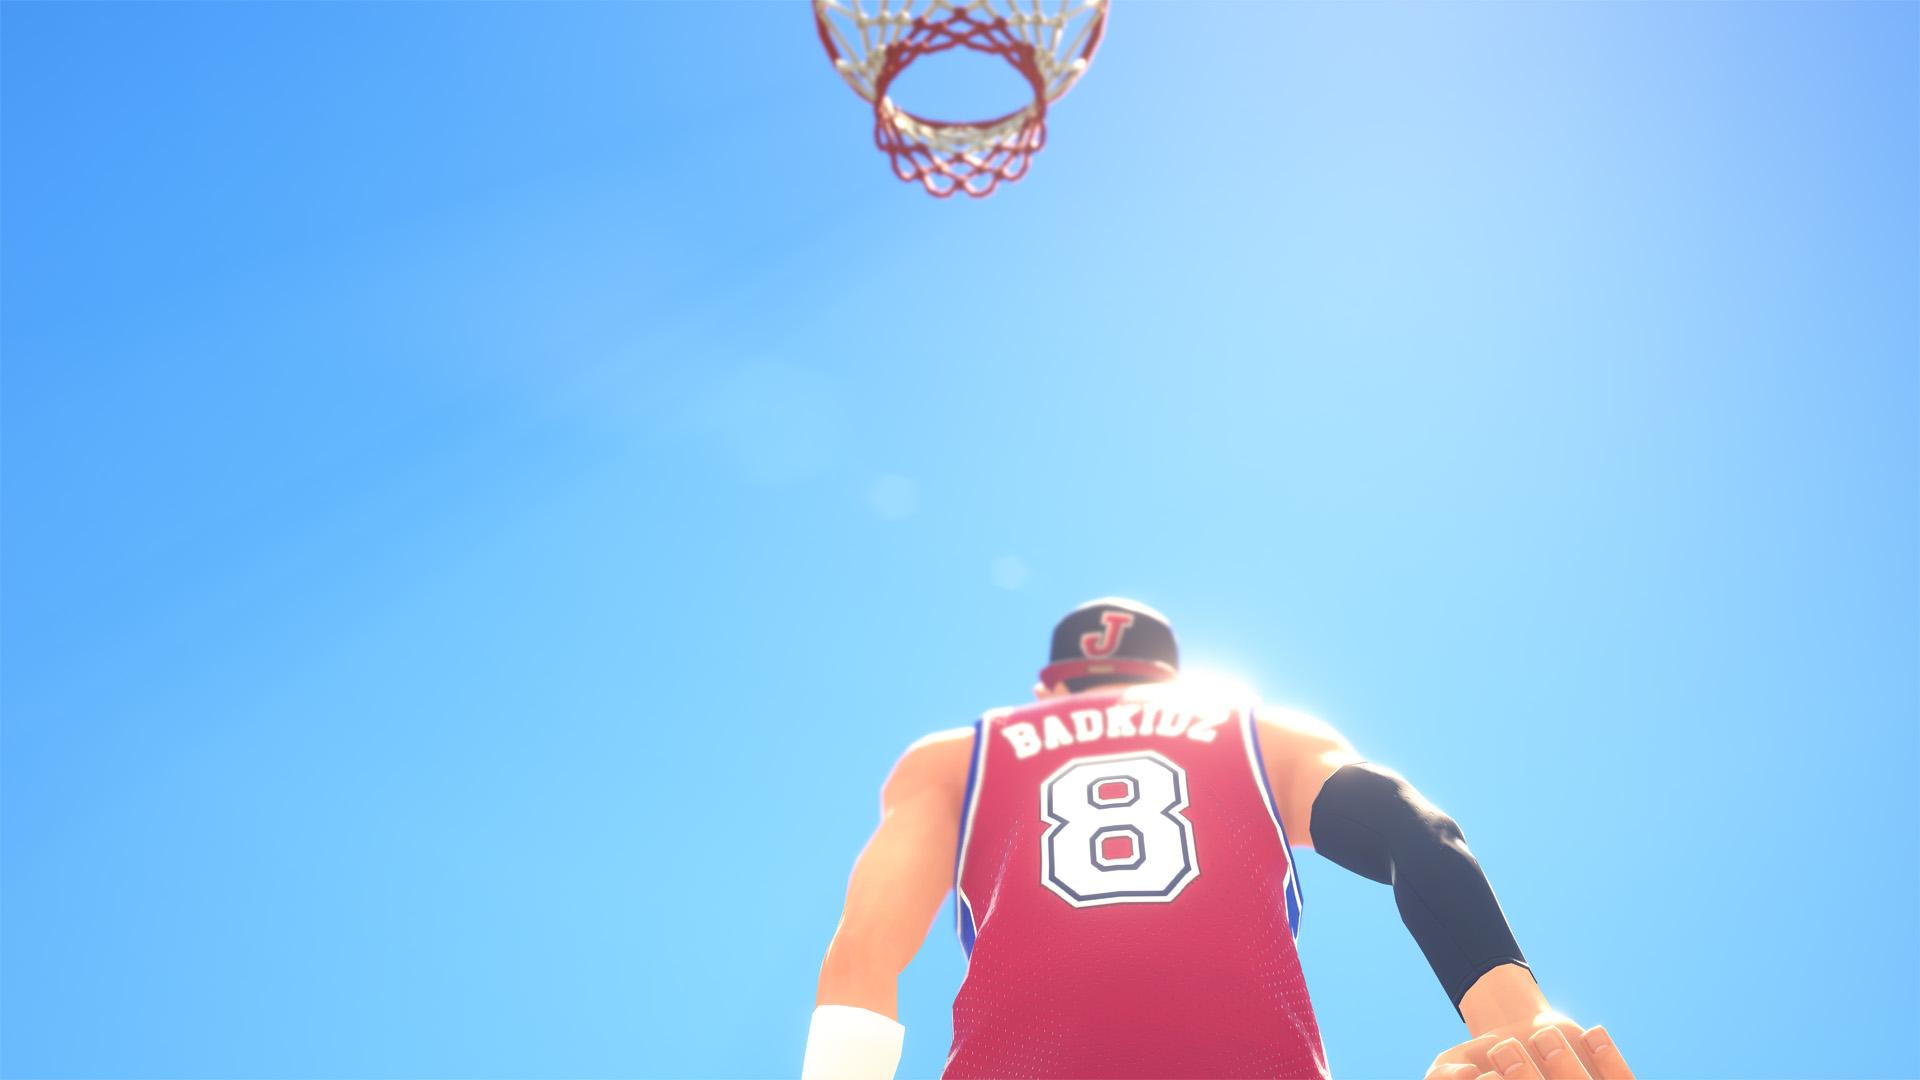 『3on3 FreeStyle』ゲーム画面